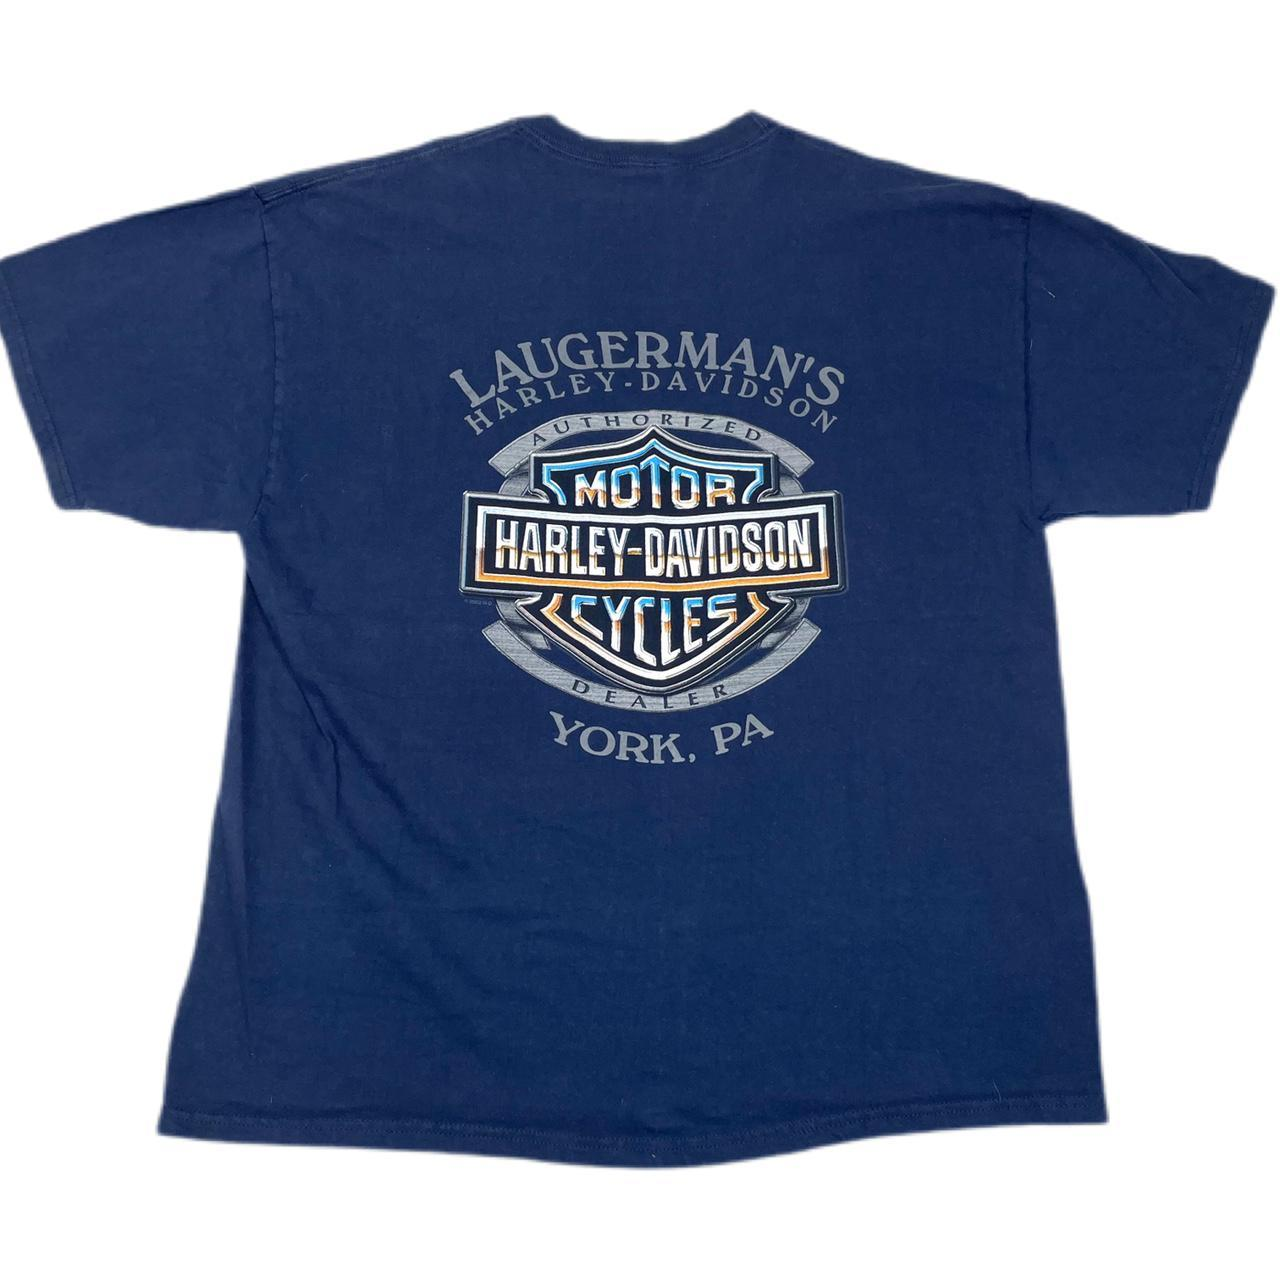 Product Image 1 - Harley Davidson Laugerman's York PA